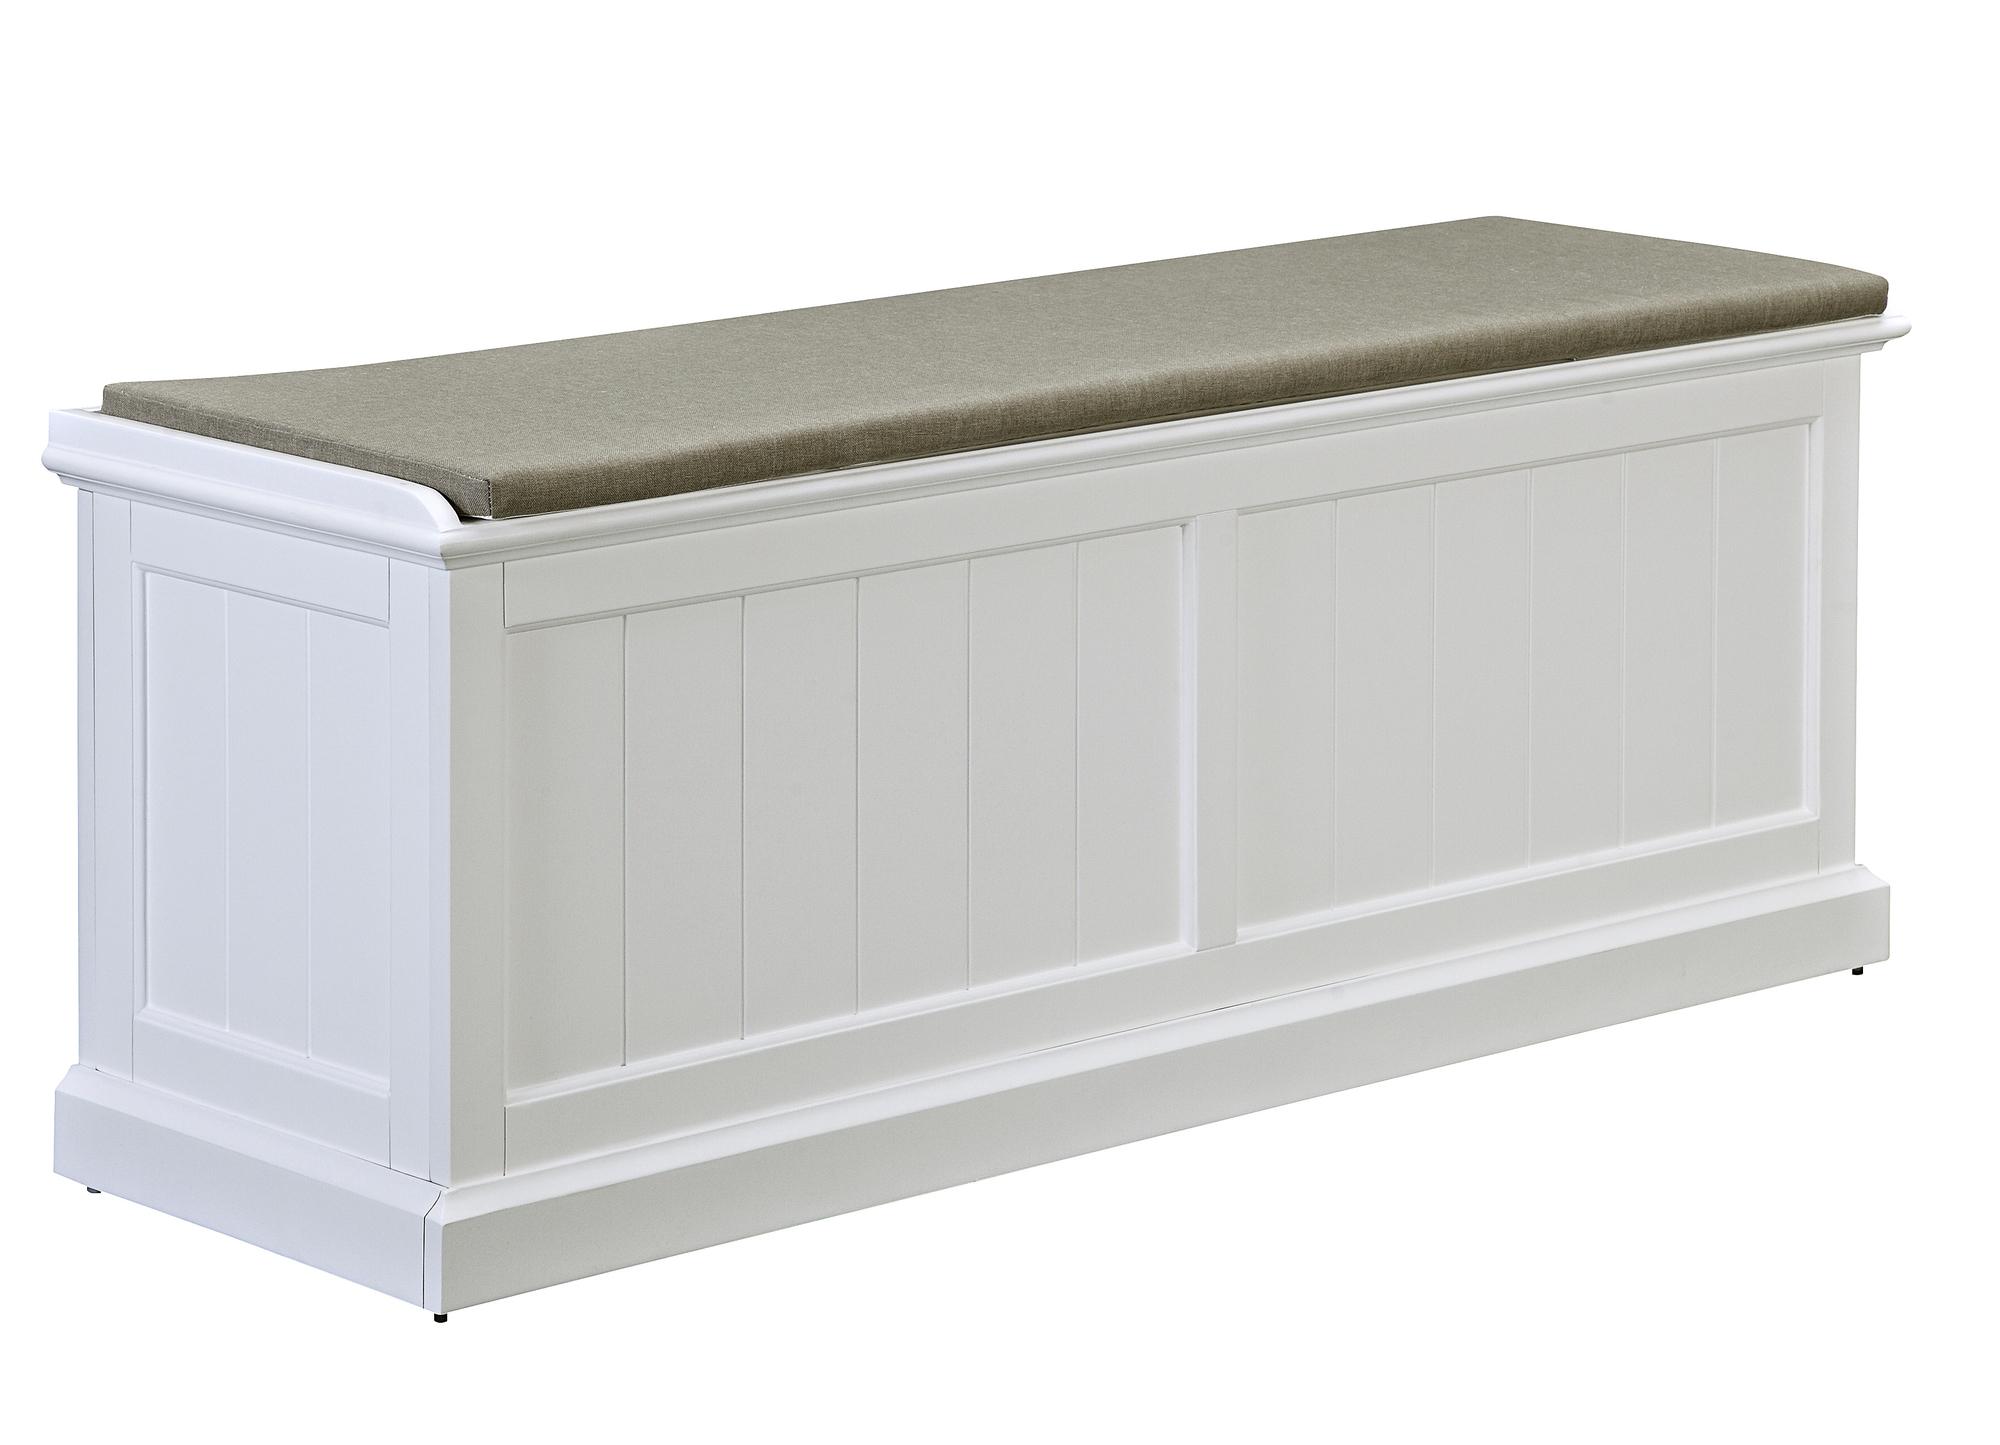 Hamptons Cushioned Storage Bench